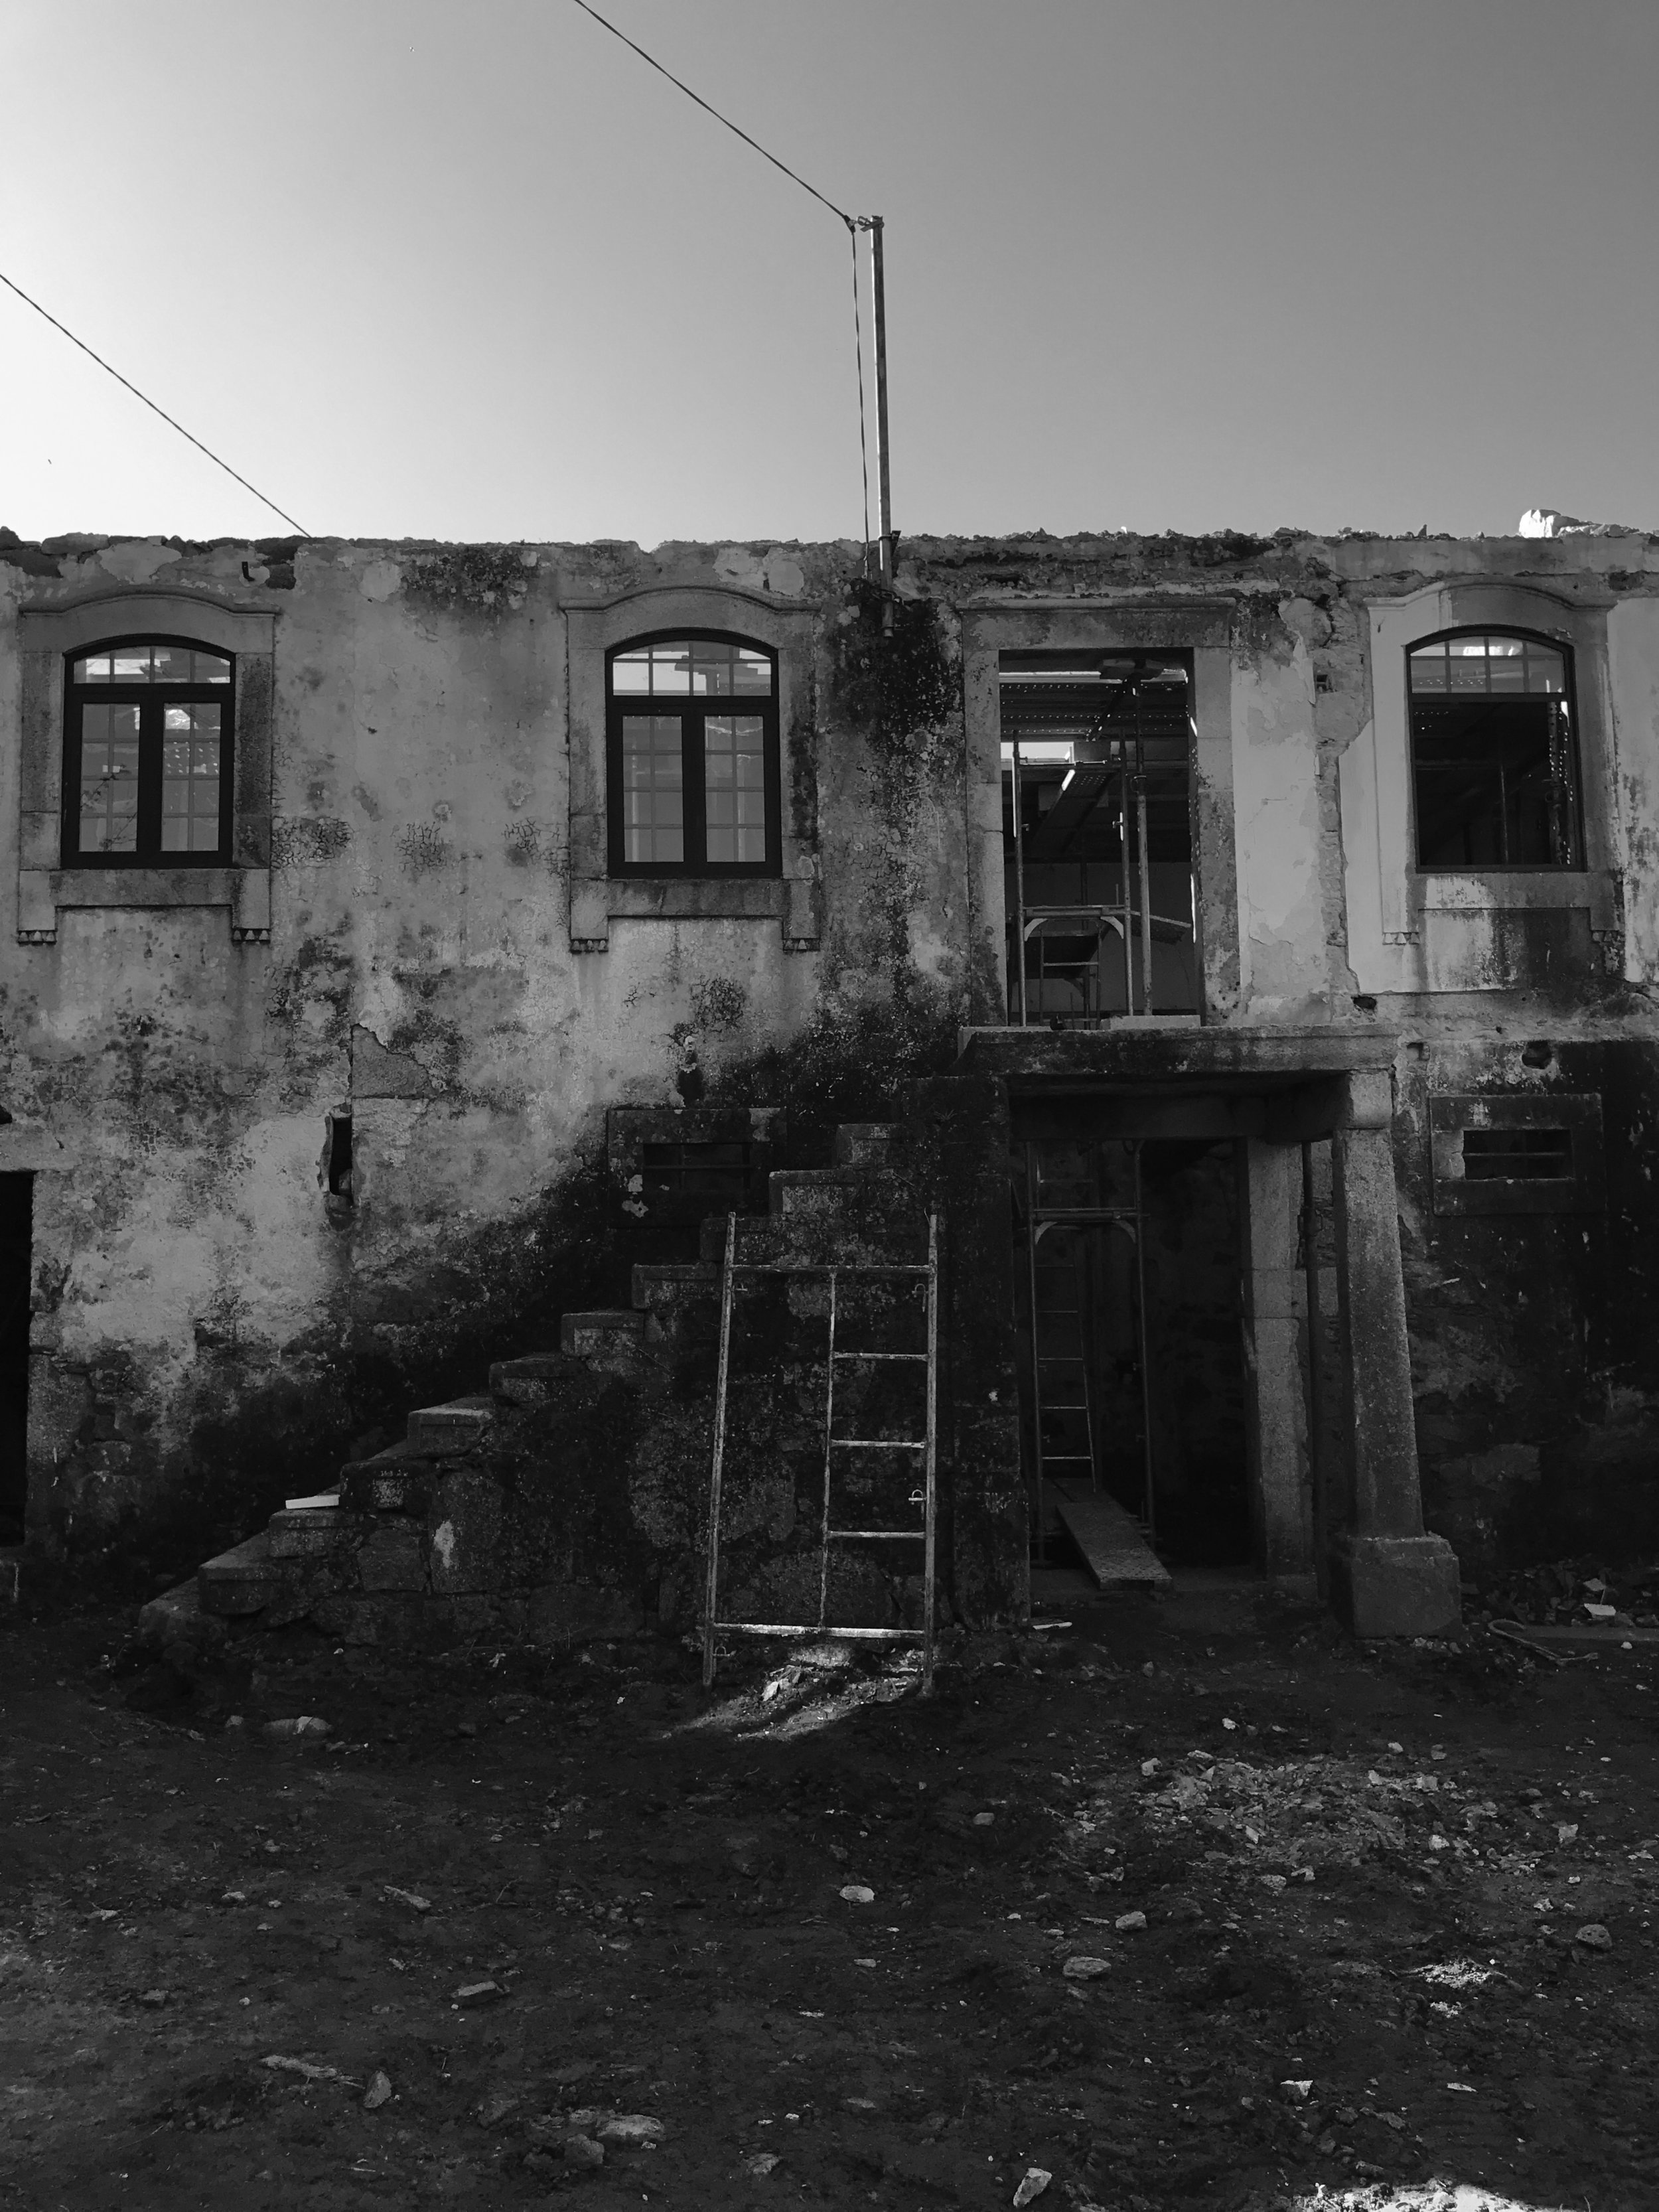 Moradia Folgorosa - Vale de Cambra - EVA atelier - Arquitectura - Obra - Arquitecto - Porto - EVA evolutionary architecture (20).jpg